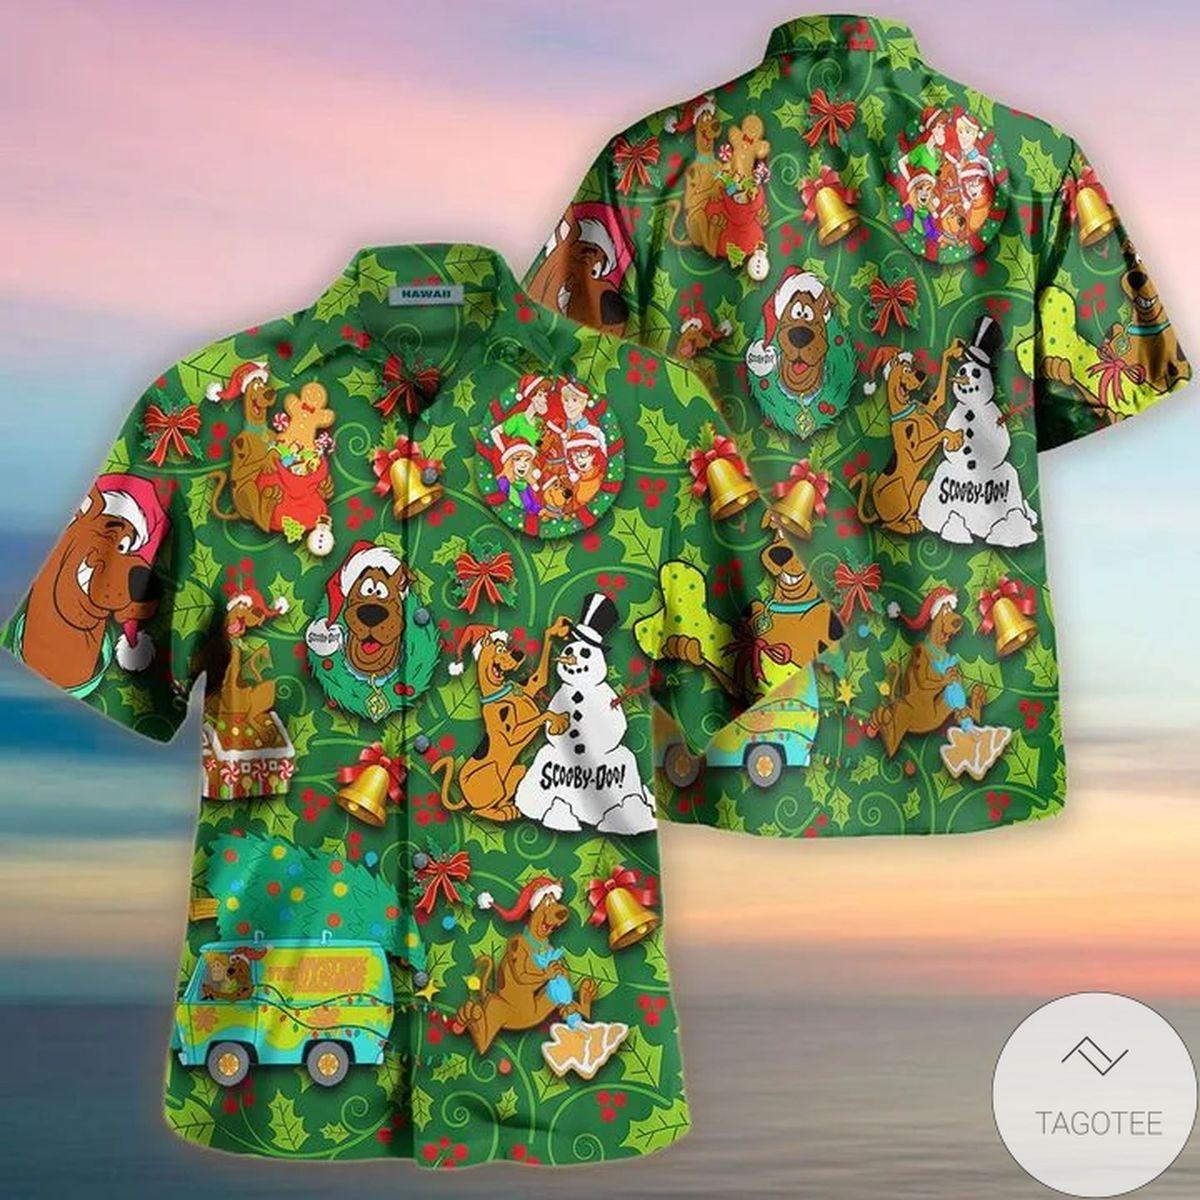 We'll All Be Home For Christmas Scooby Doo Hawaiian Shirt